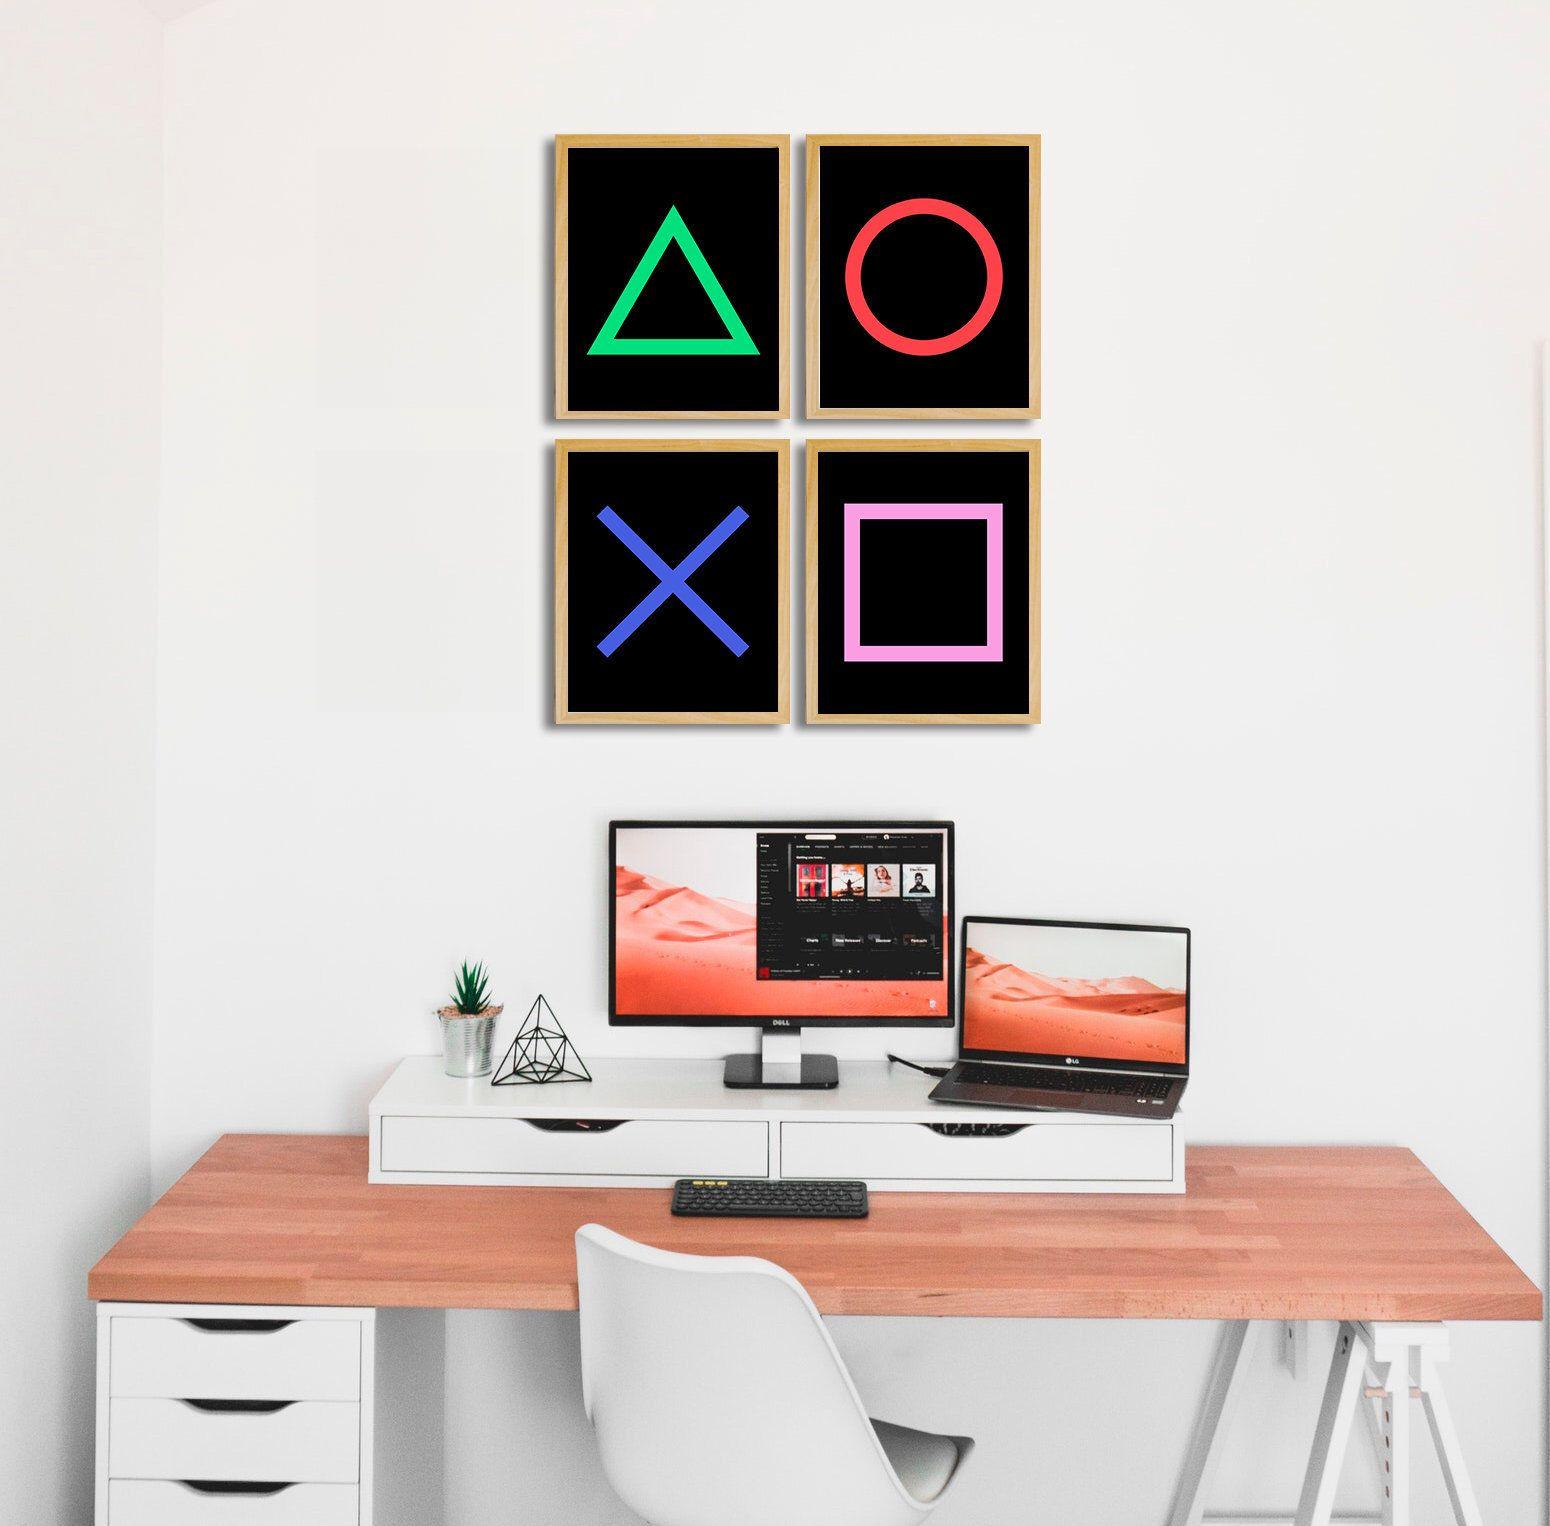 Video Game Decor Gamer Prints Gamer Room Decor Kids Wall Etsy In 2020 Gamer Room Diy Game Room Wall Art Gaming Decor